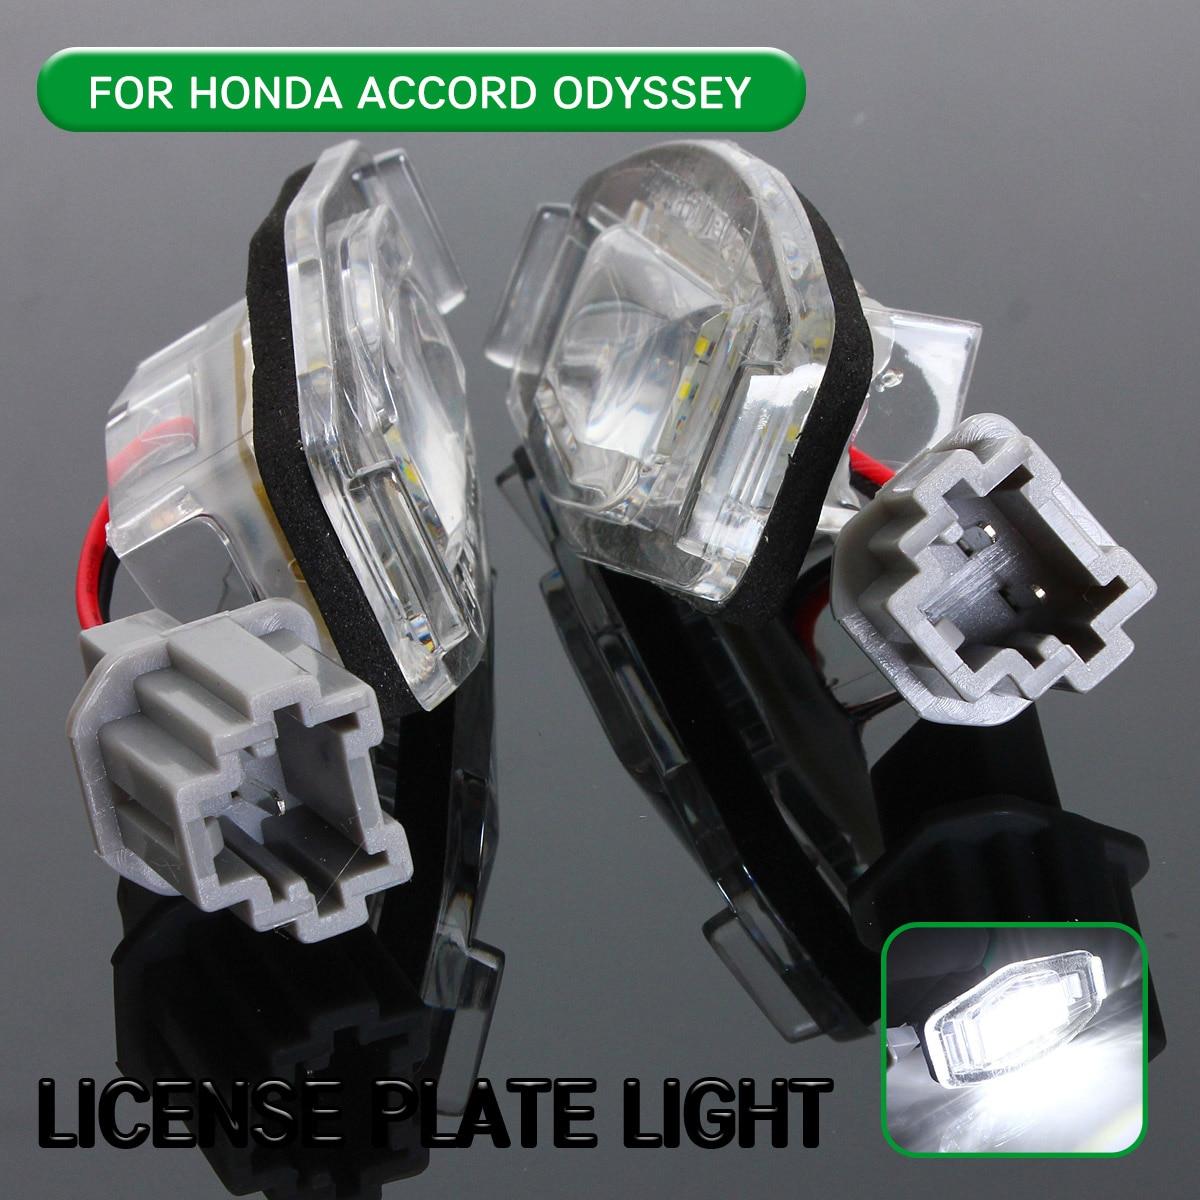 2pc LED Lizenz Nummer Platte Licht Lampe Für Honda Accord Odyssey Civic Limousine Stadt Acura MDX TSX ILX RDX RL TL